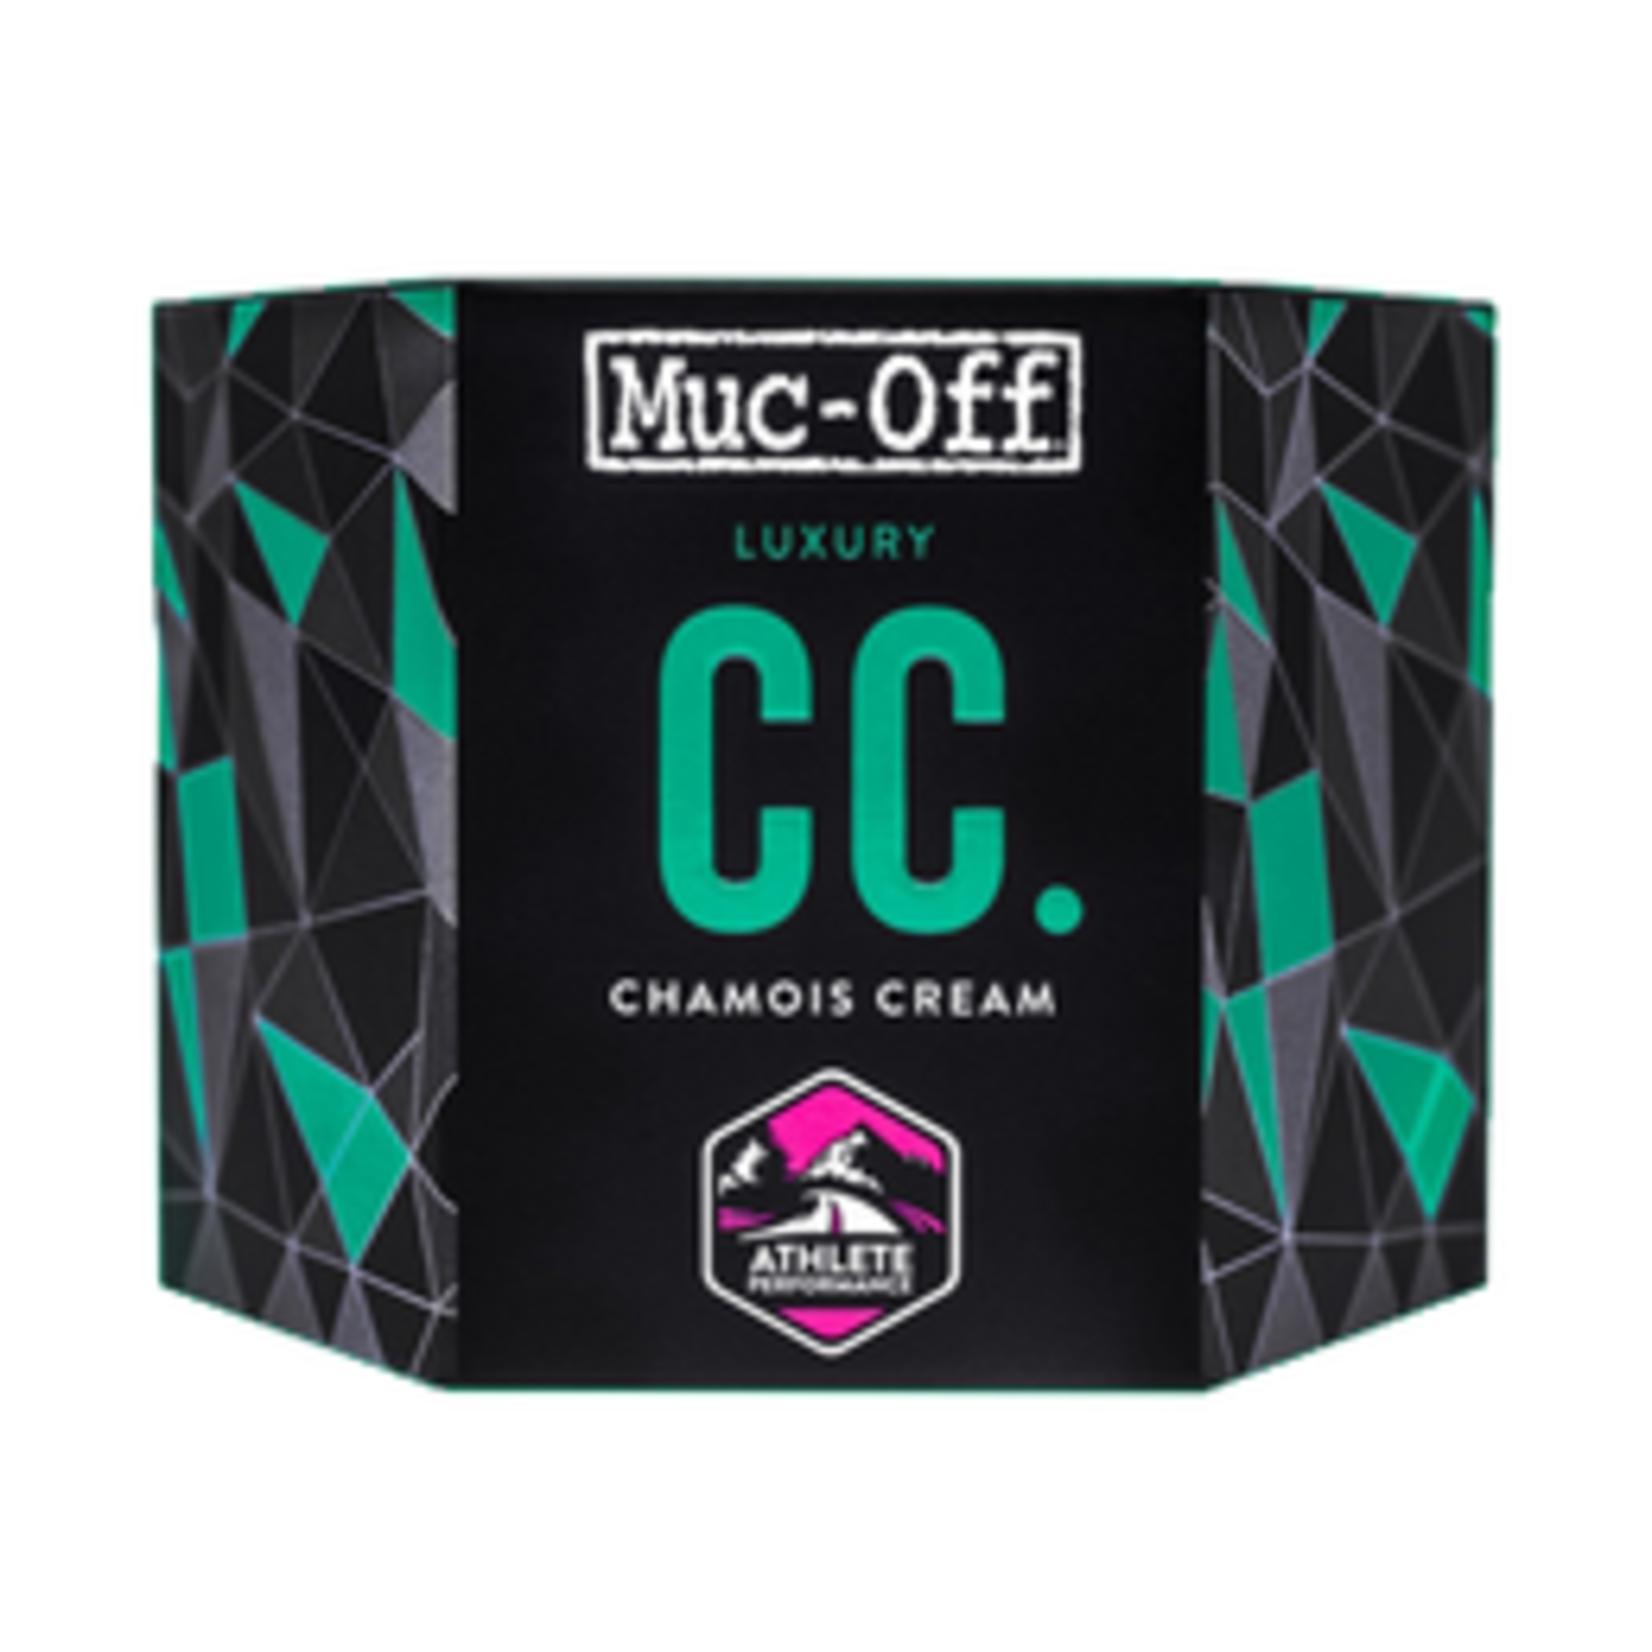 Muc-Off Muc-Off Luxury Chamois Cream 250ml #339